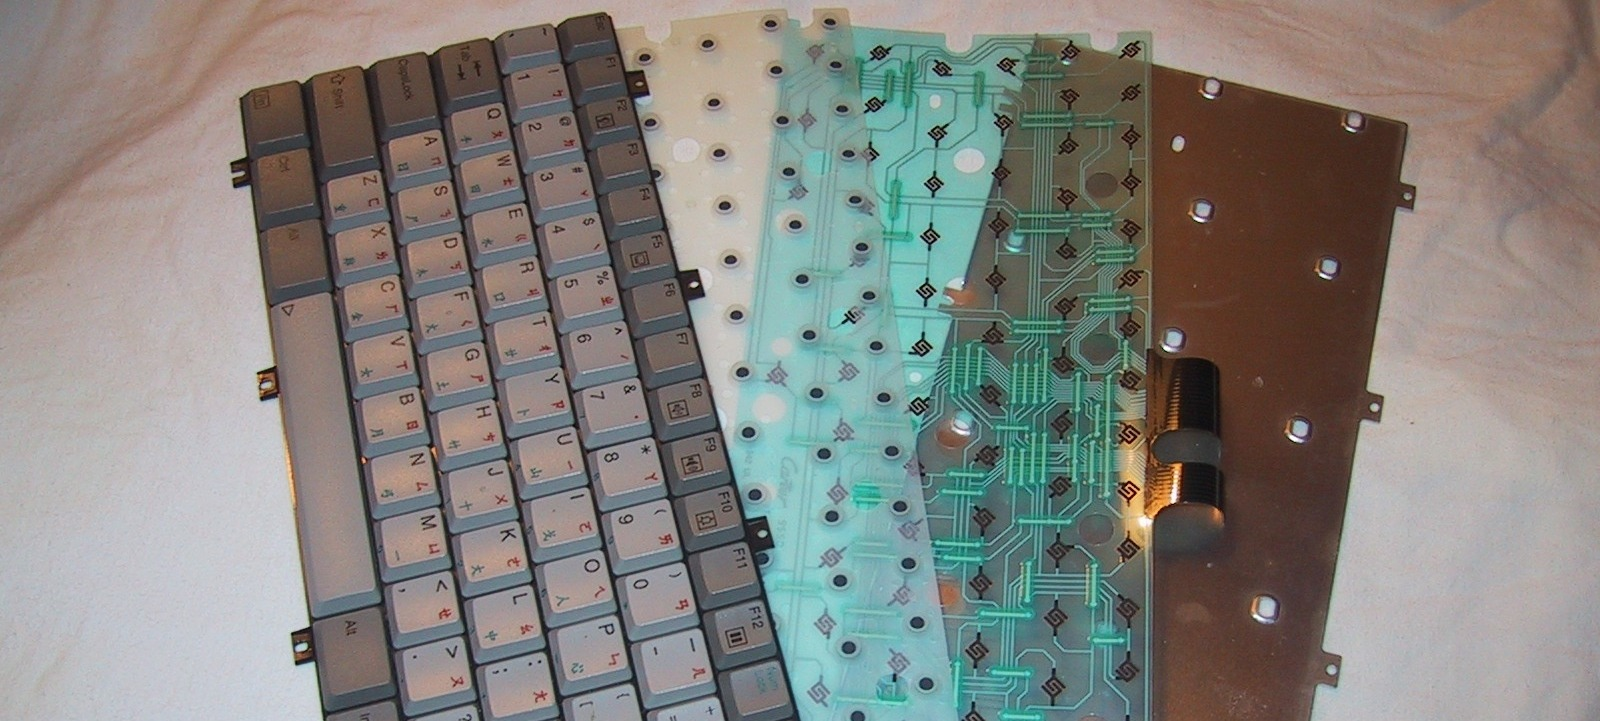 Membrane layers